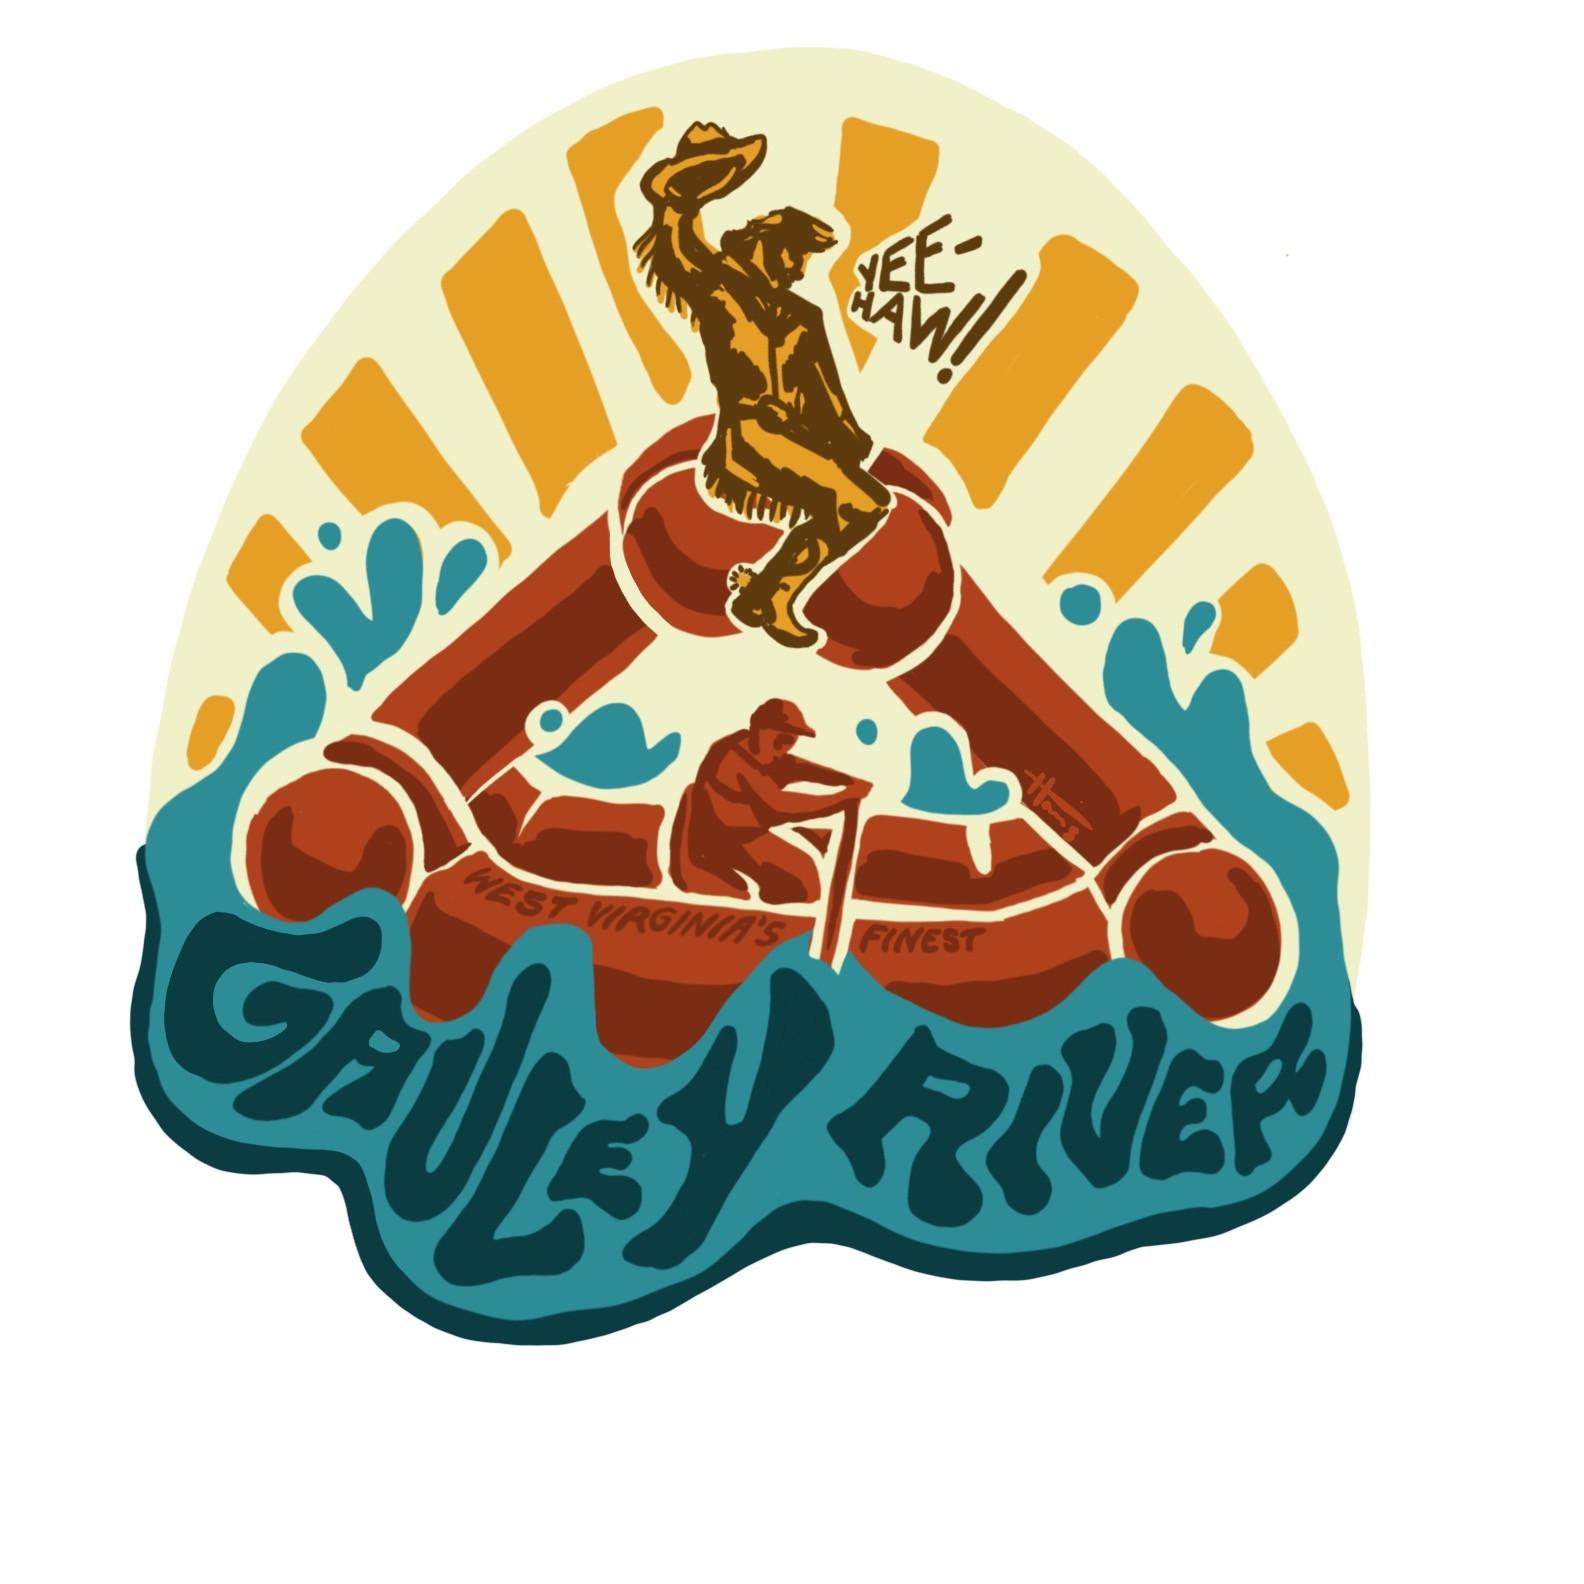 Gauley River creature craft sticker design